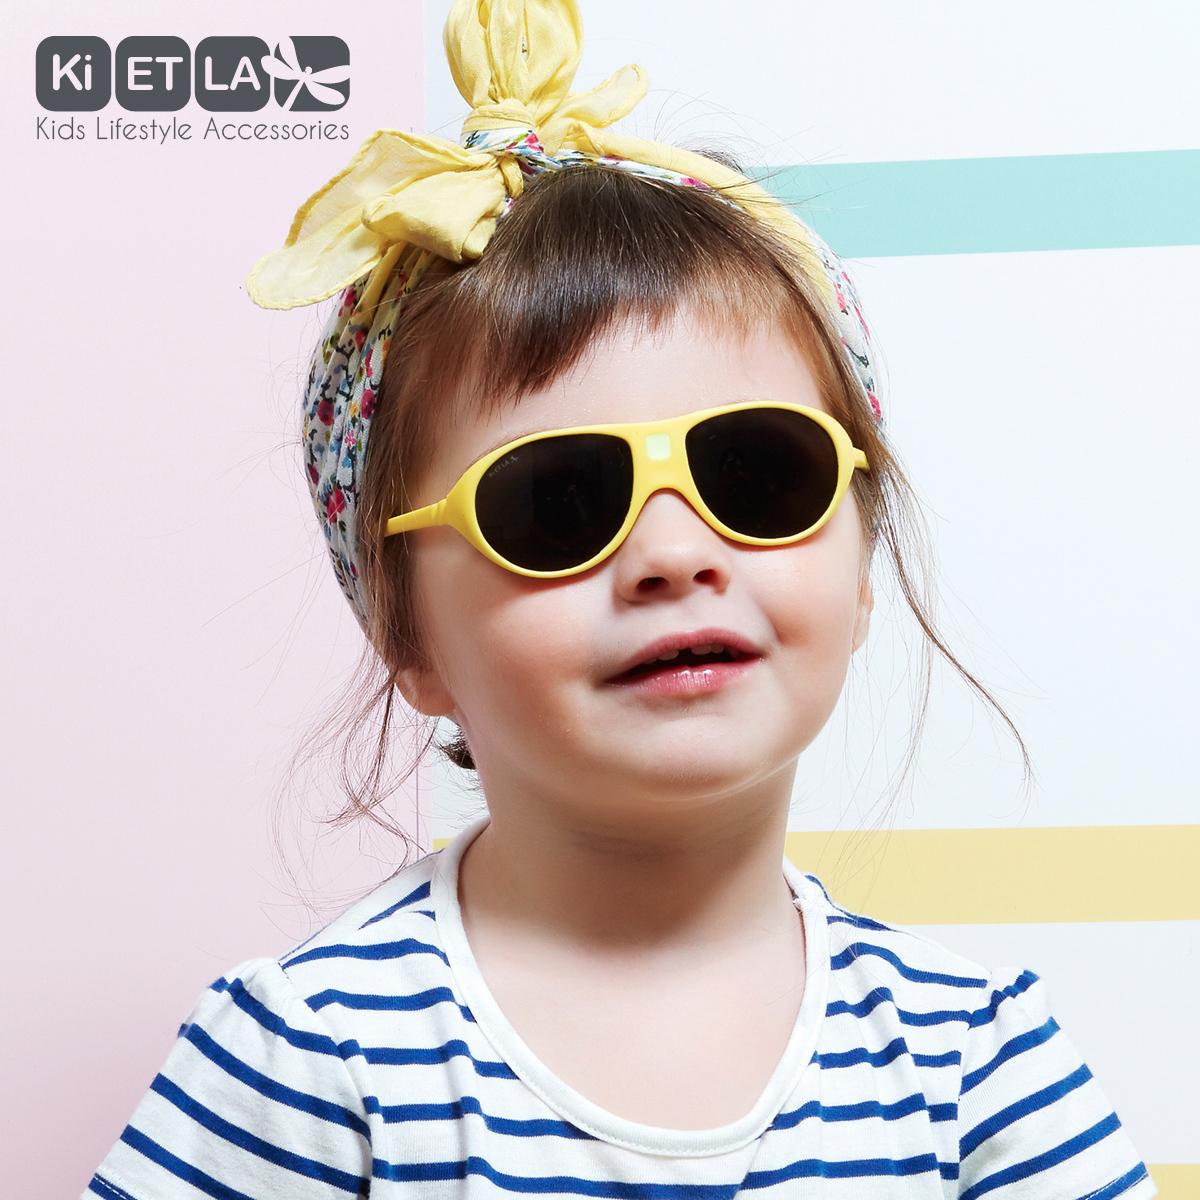 Ki ET LA sunglasses JOKALA 2-4 years